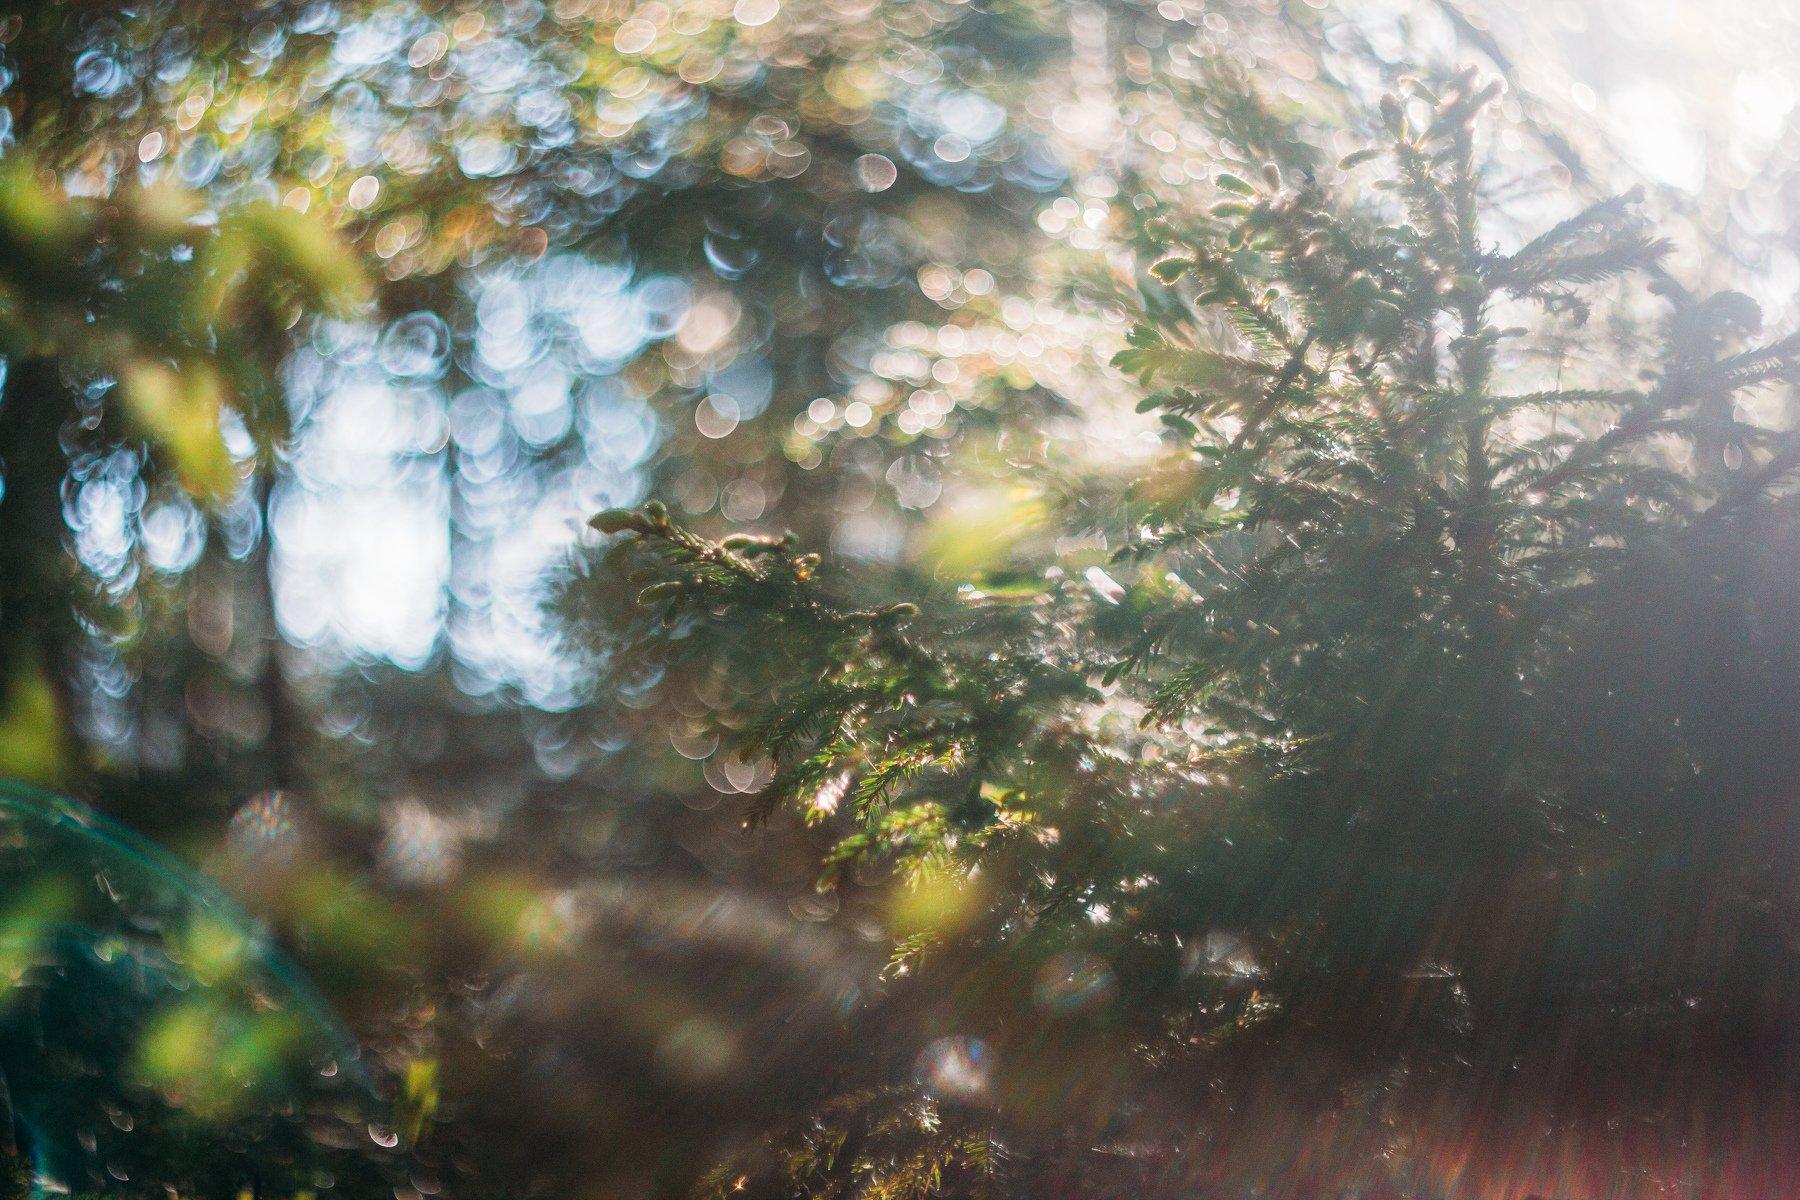 солнце, свет, лес, утро, боке, гелиос, Афиногенова Татьяна